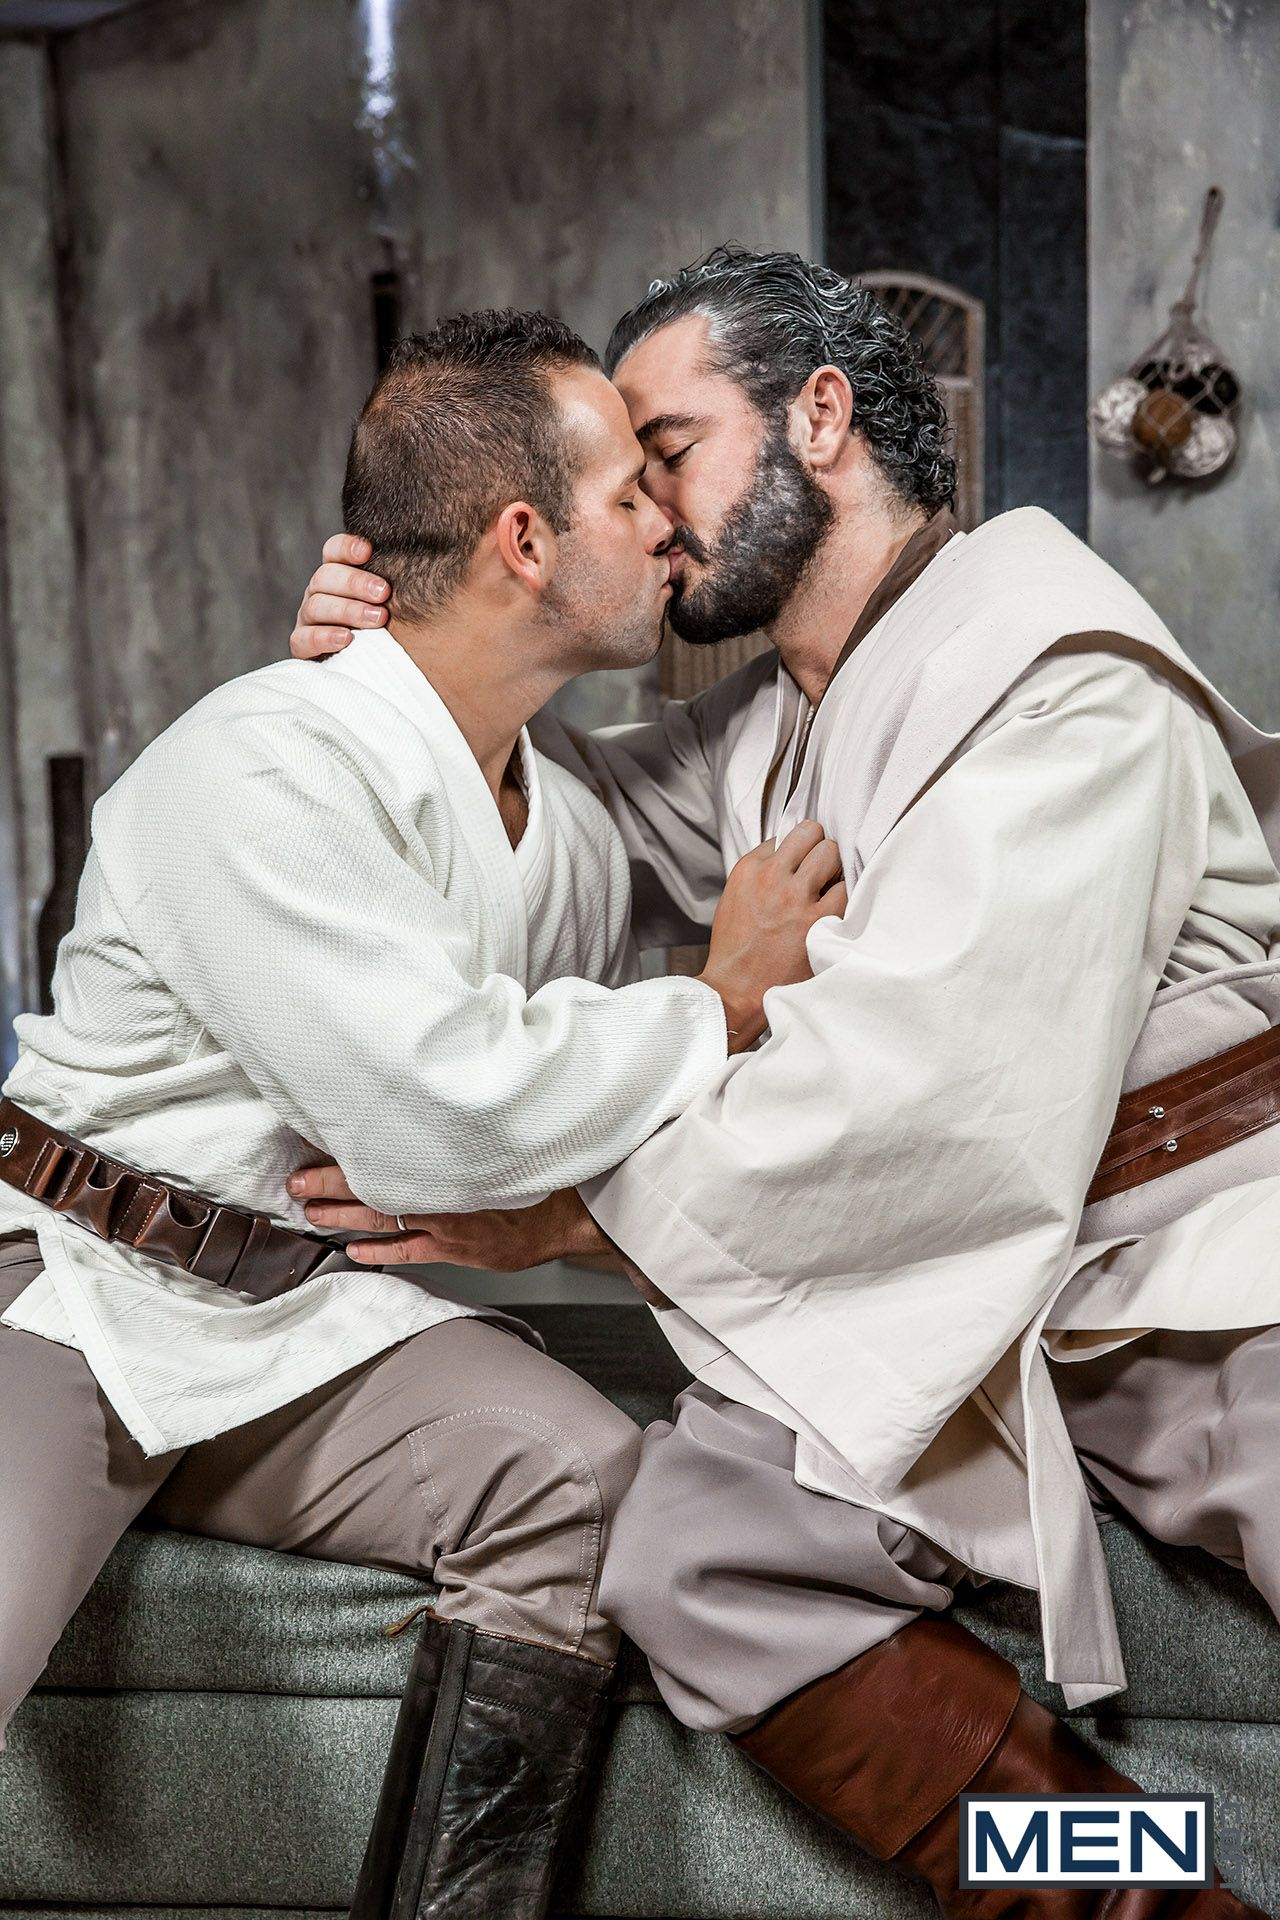 gay escorts brisbane australia